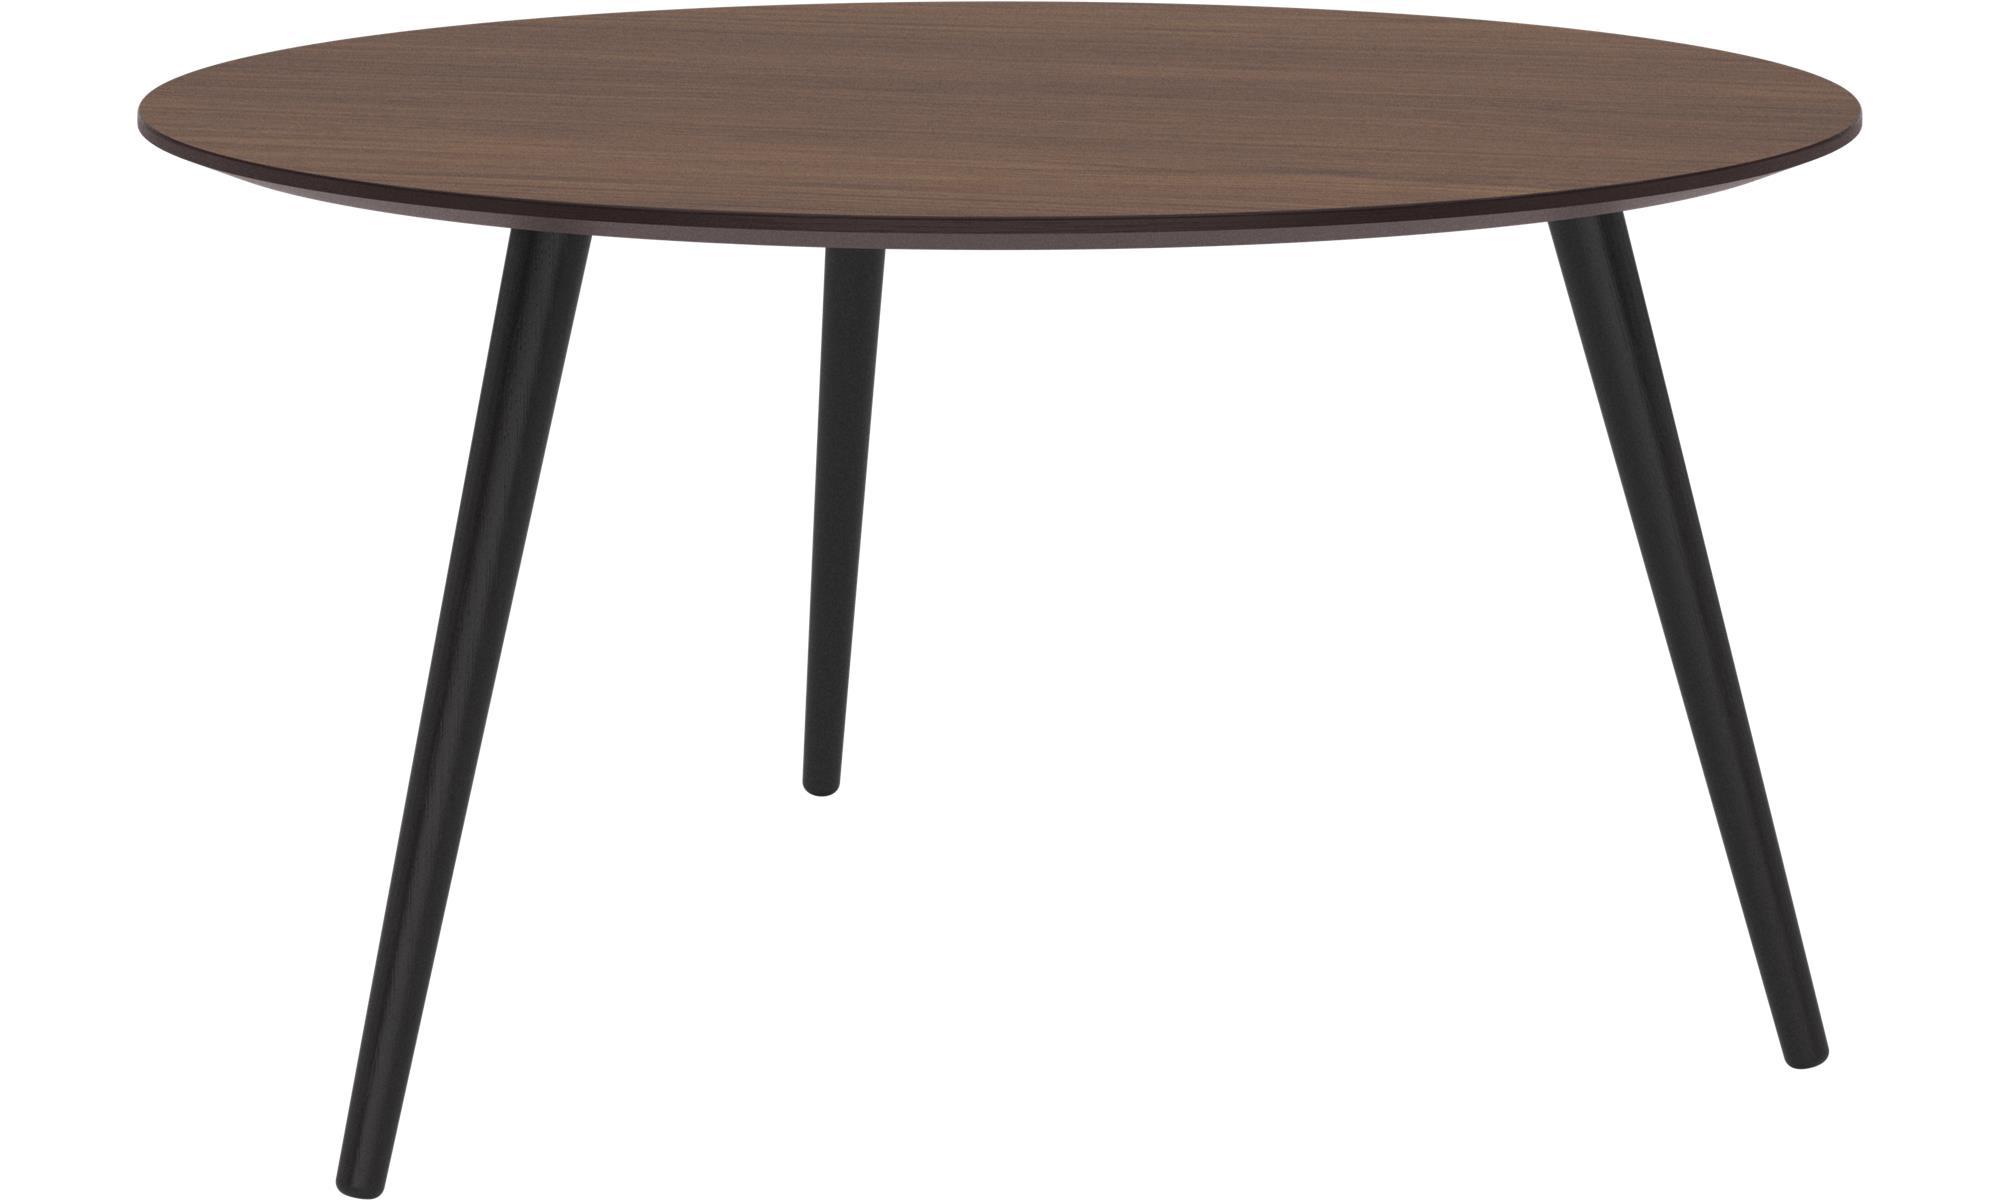 【Table】Bornlm coffetable 20%off